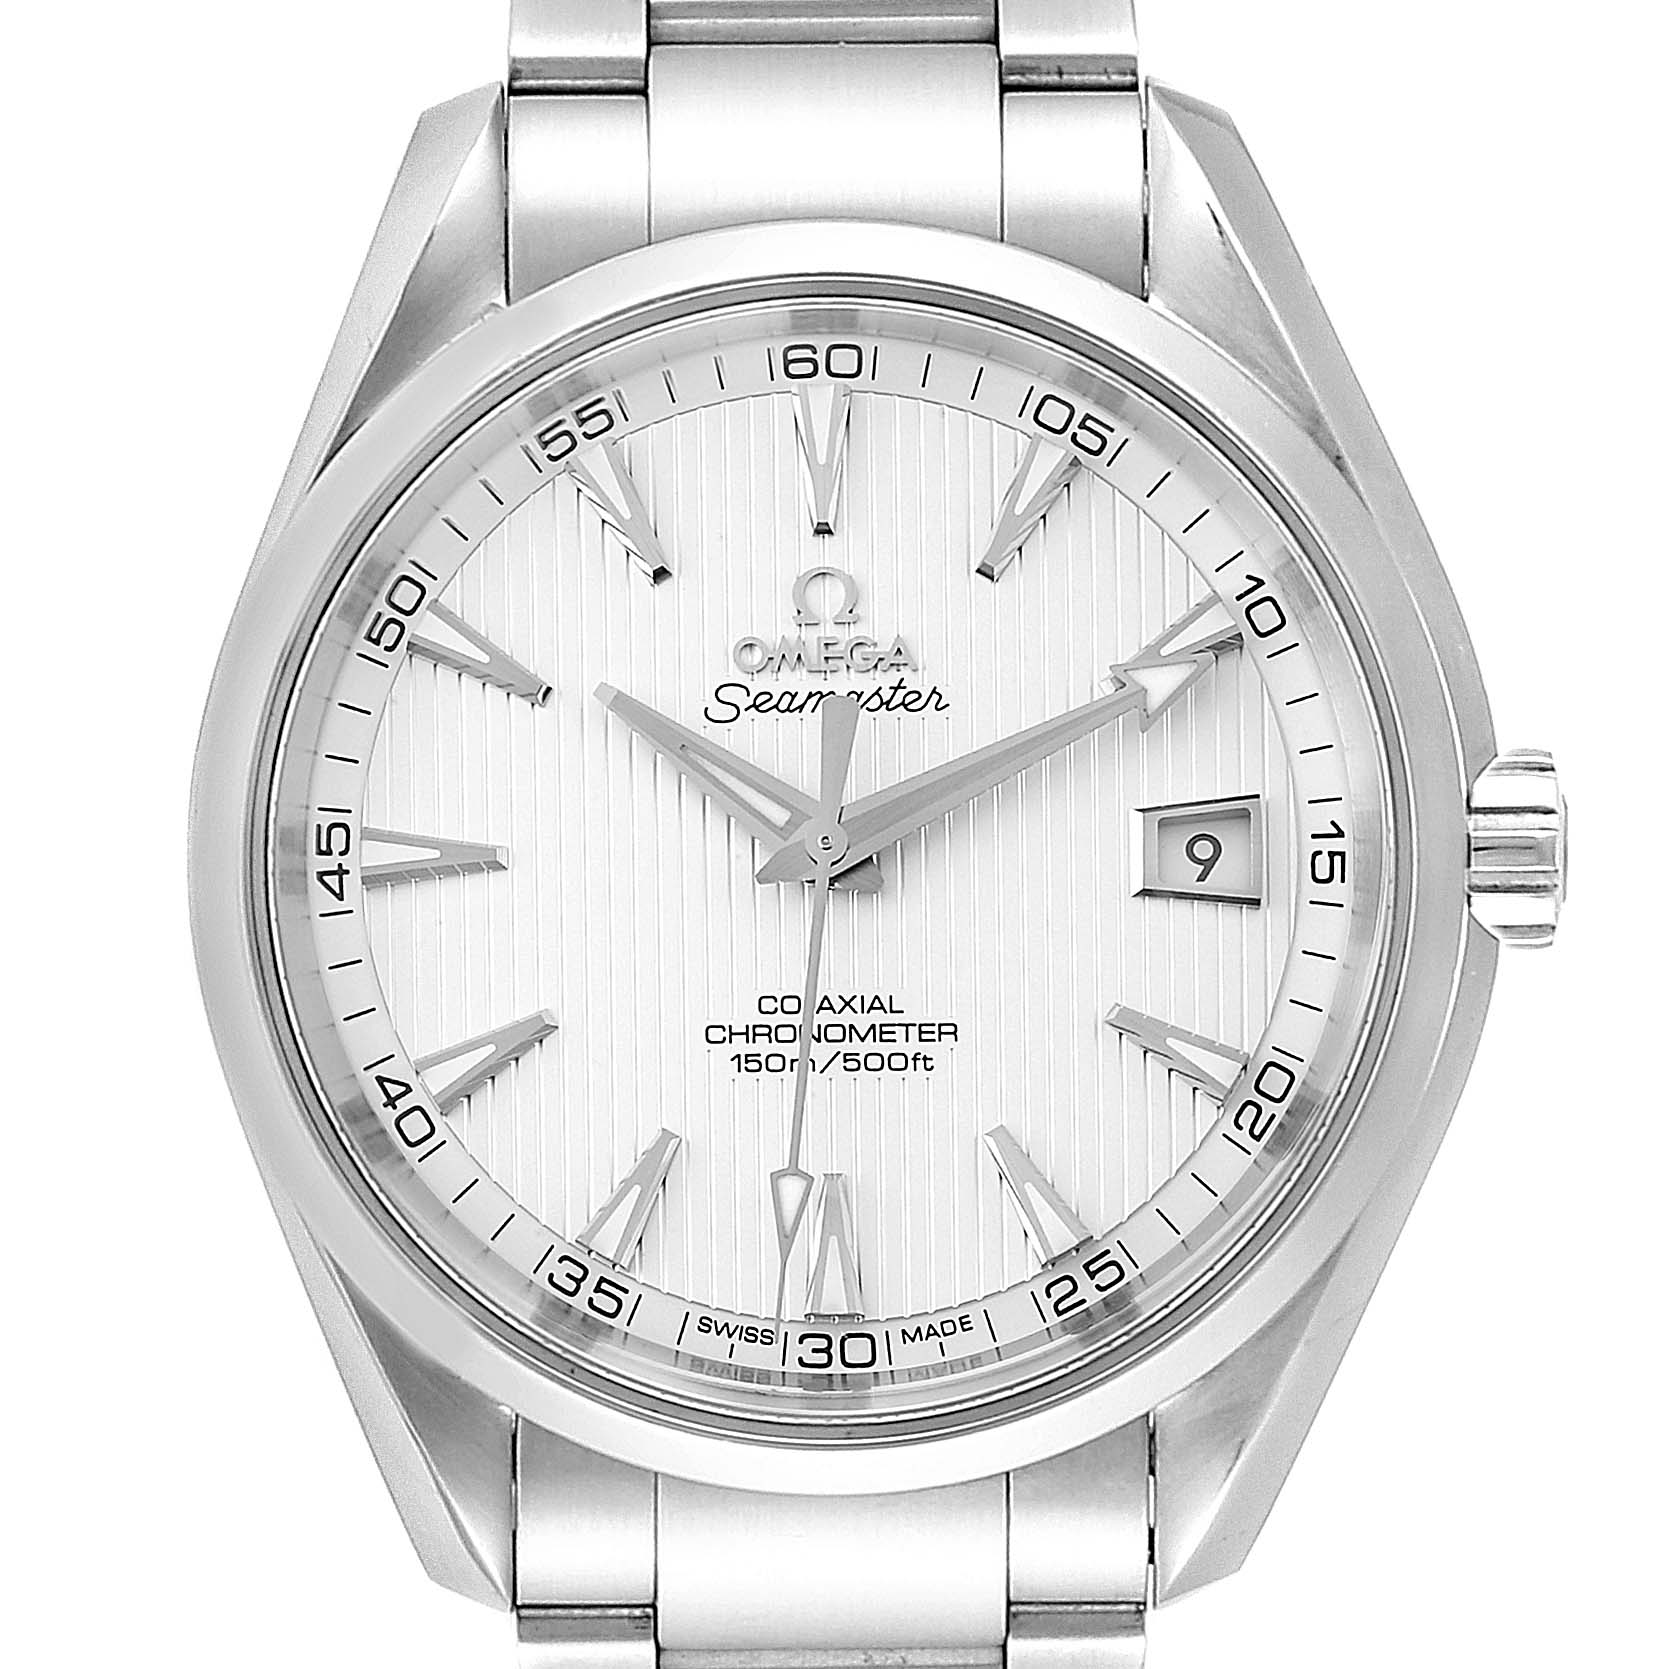 Omega Seamaster Aqua Terra Co-Axial Steel Watch 231.10.42.21.02.001